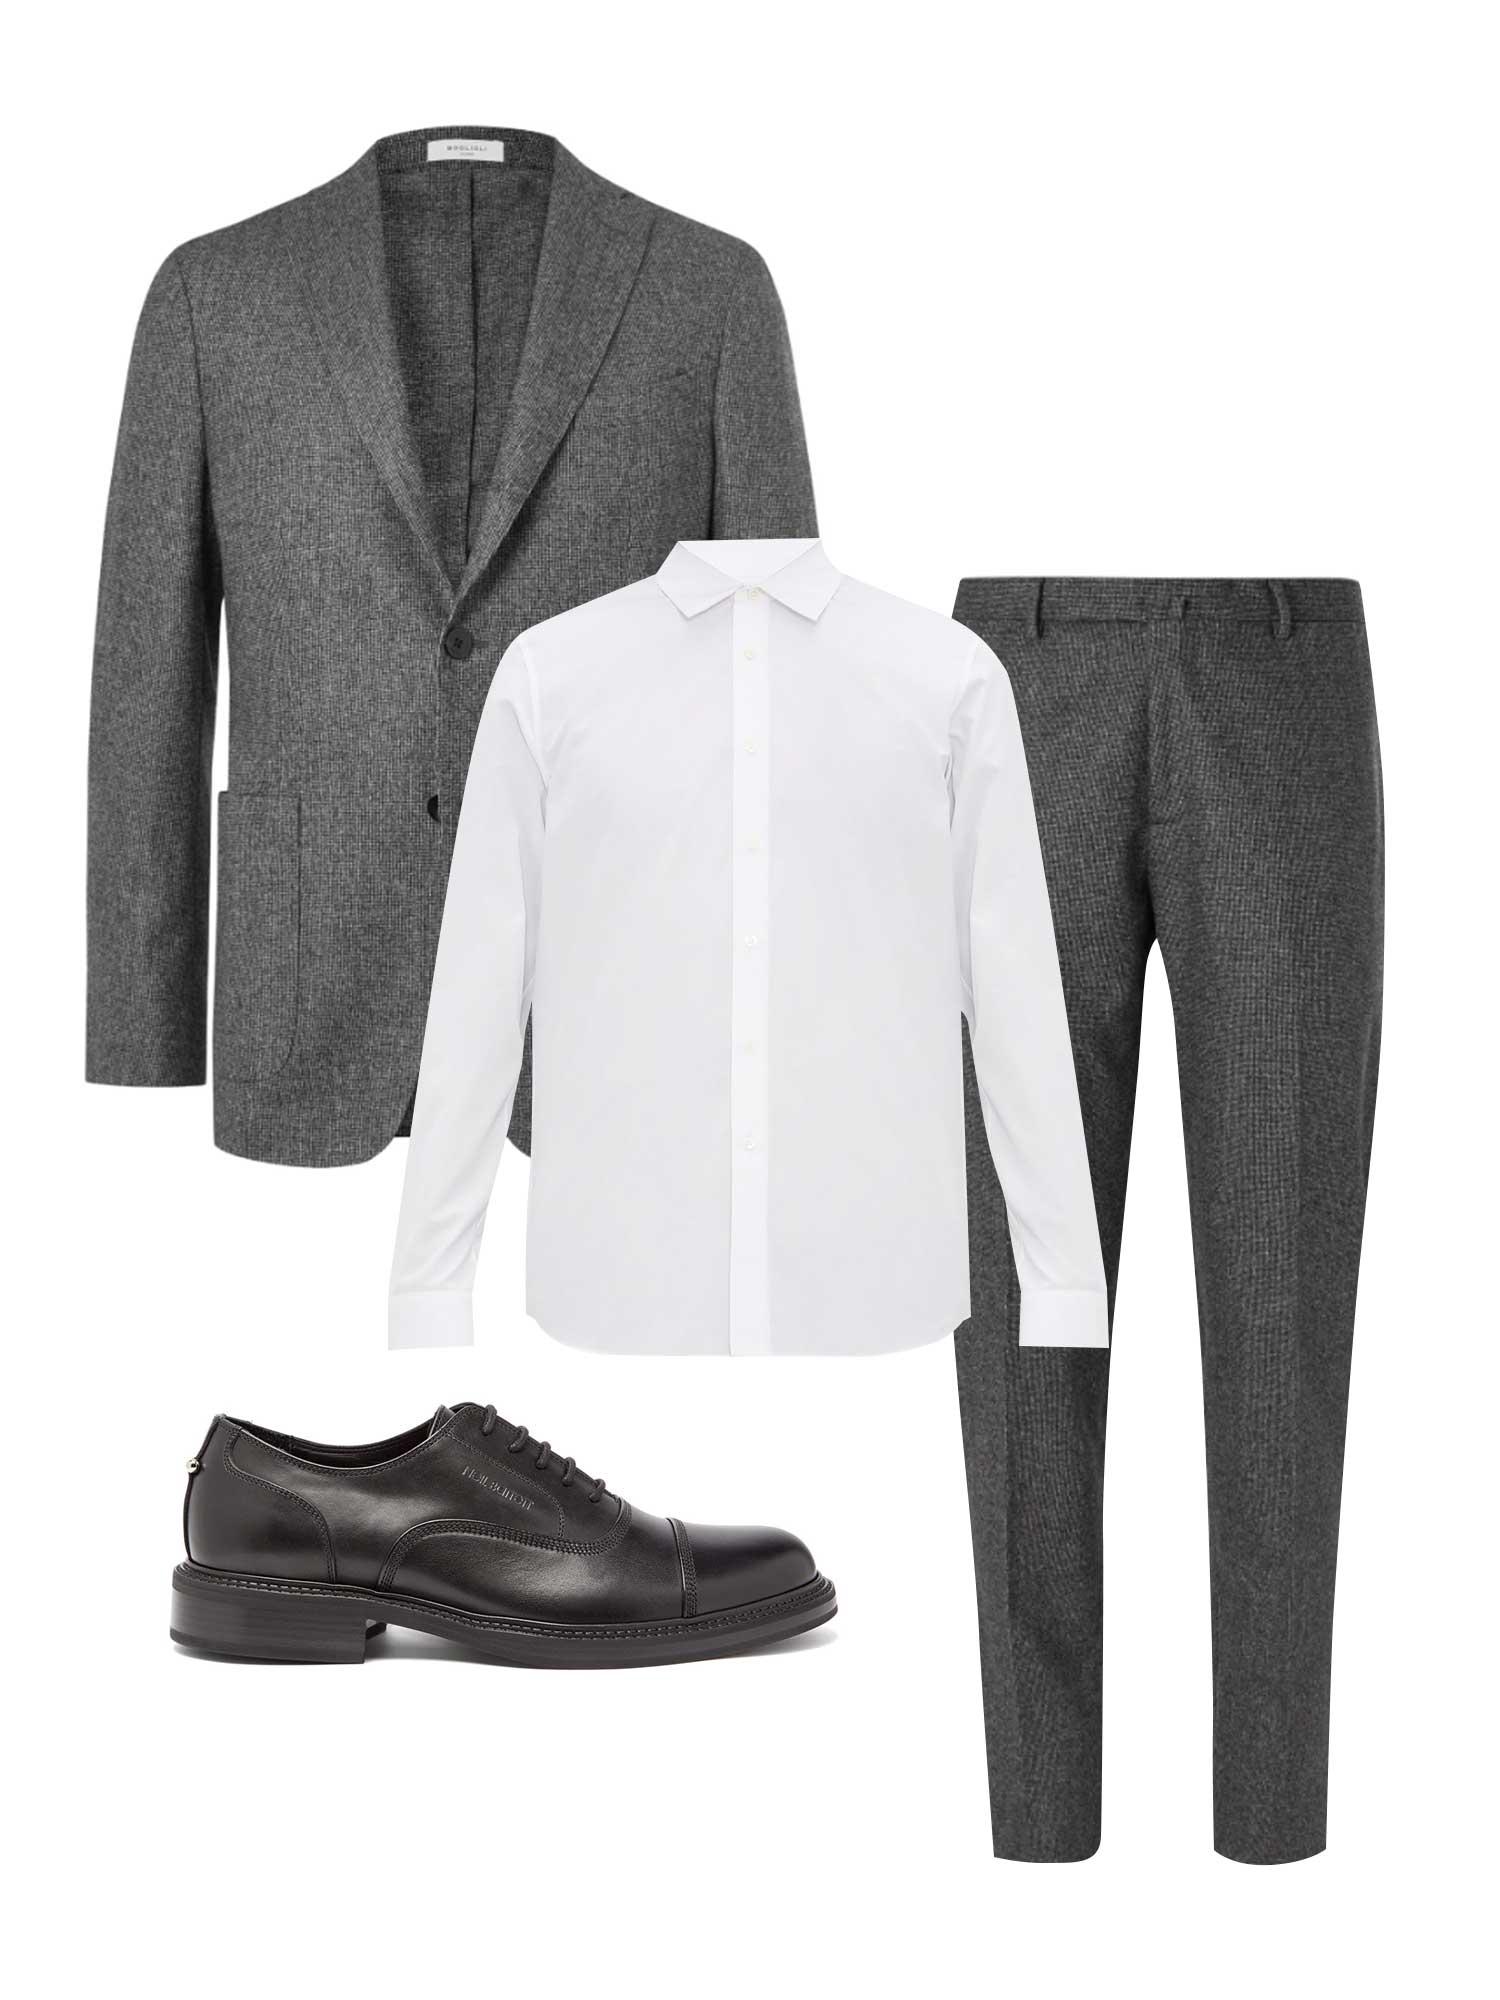 Пиджак Boglioli, €714; брюки Boglioli, €279; рубашка Jil Sander, €249; обувь Neil Barrett, €401